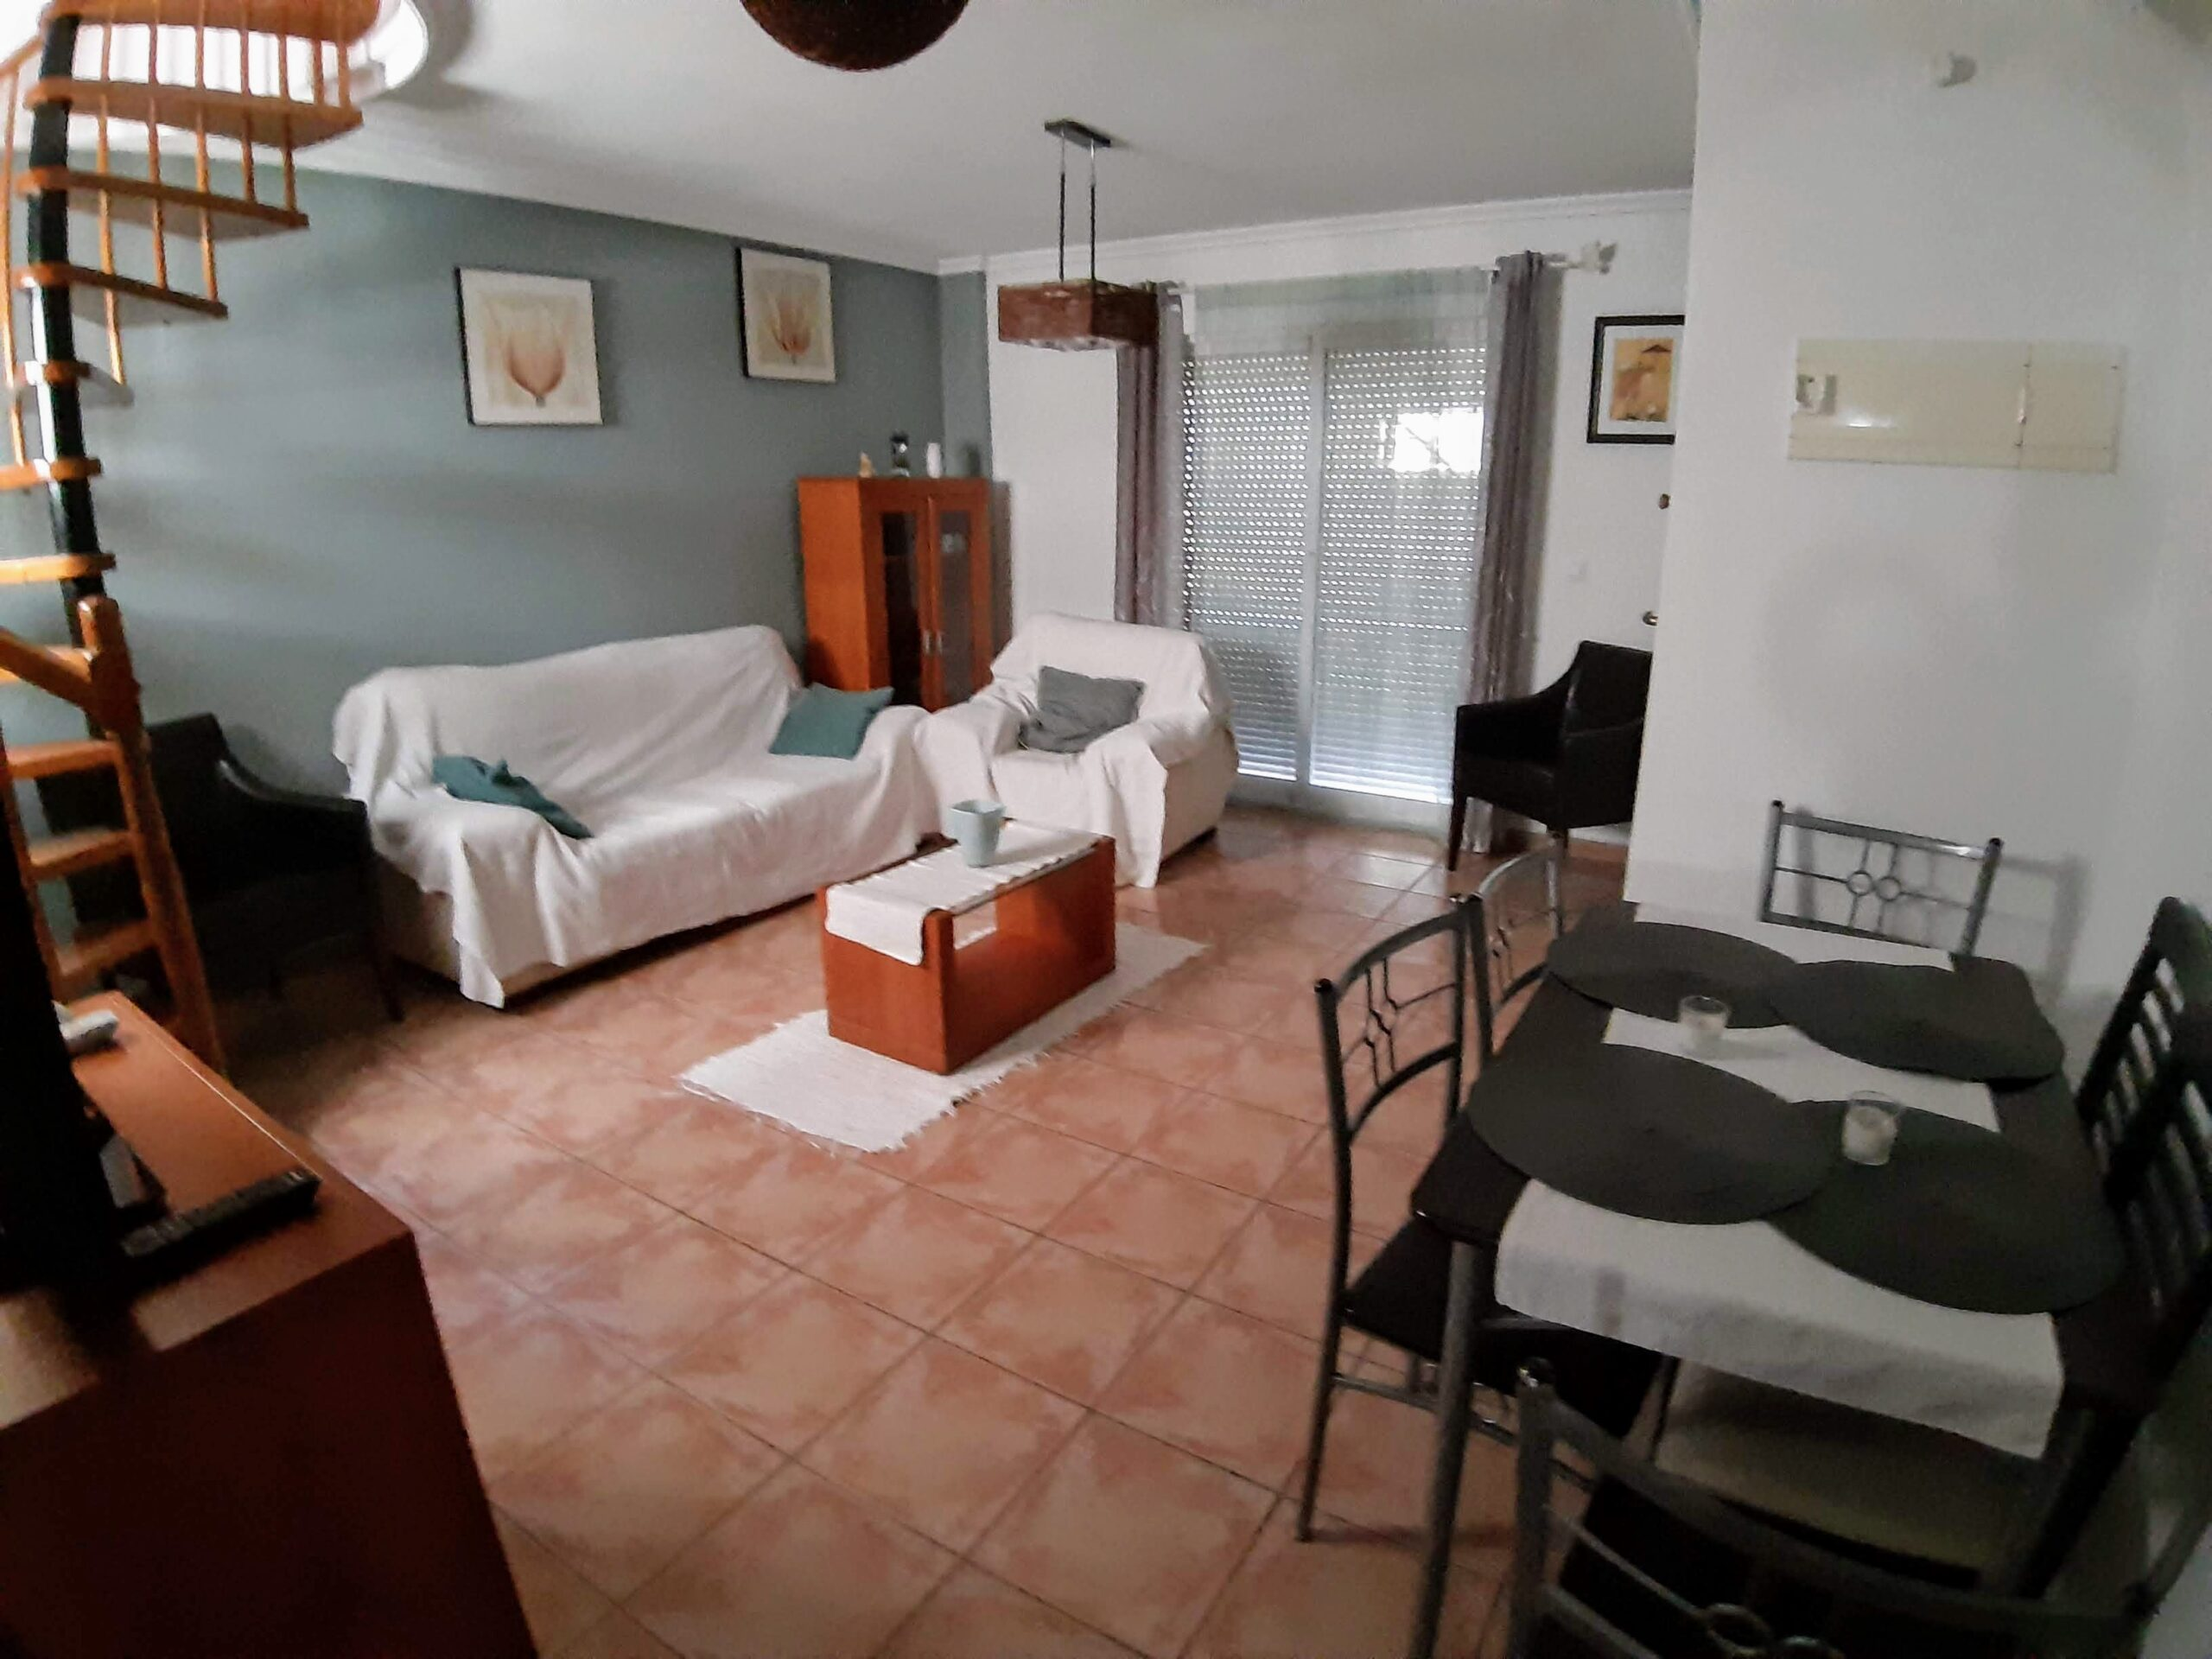 3 bedroom 2 bathroom 2nd line beach property for vacactions -Los Alacazares